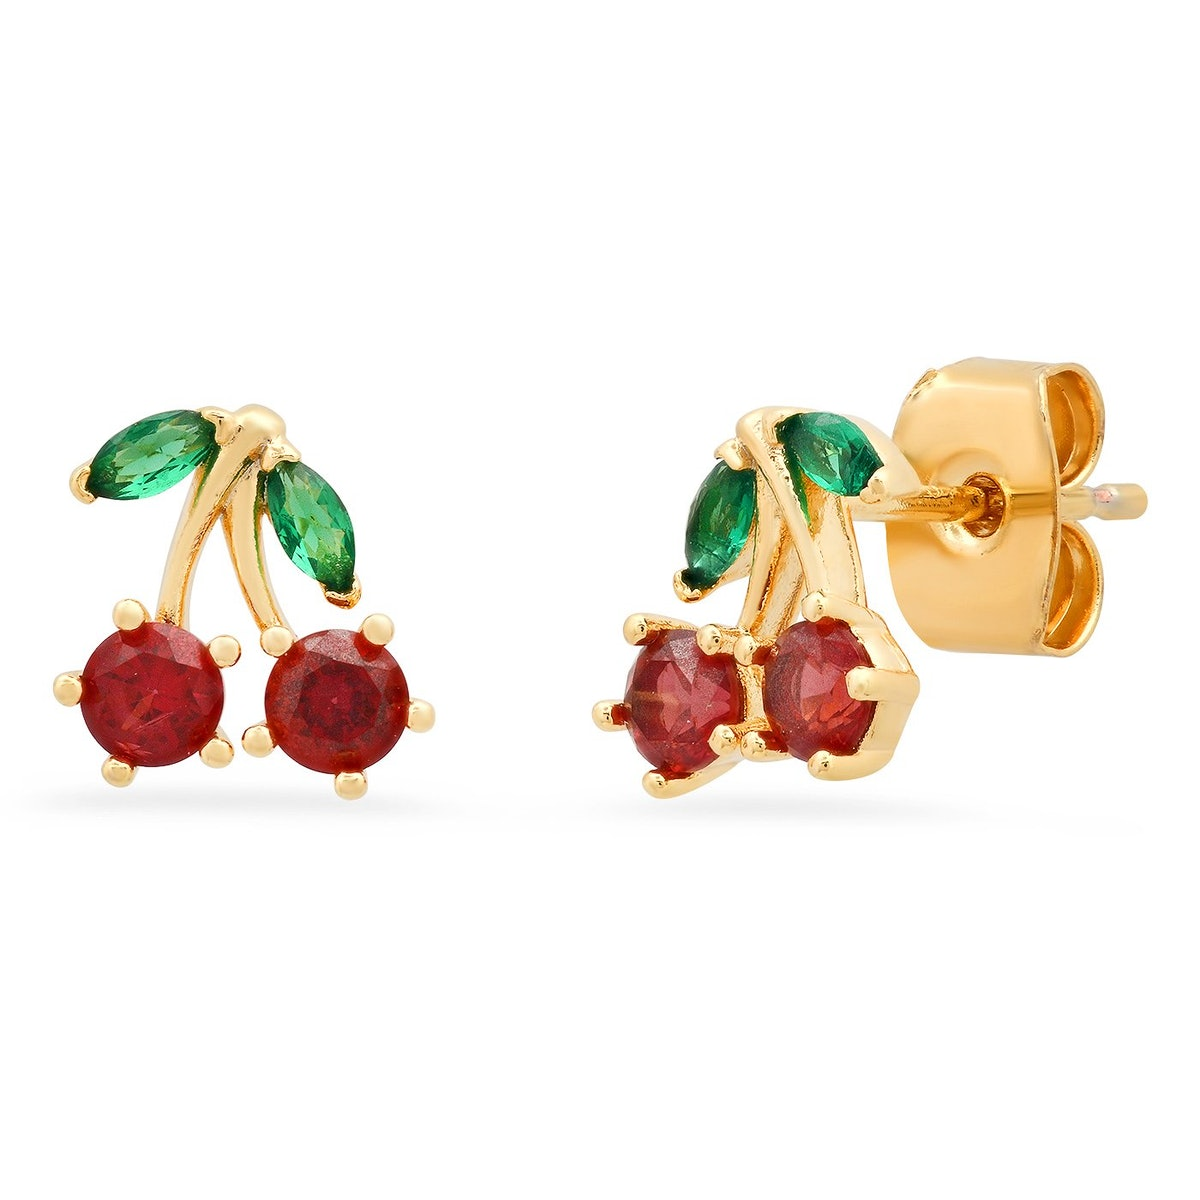 Cherry Stud Earrings